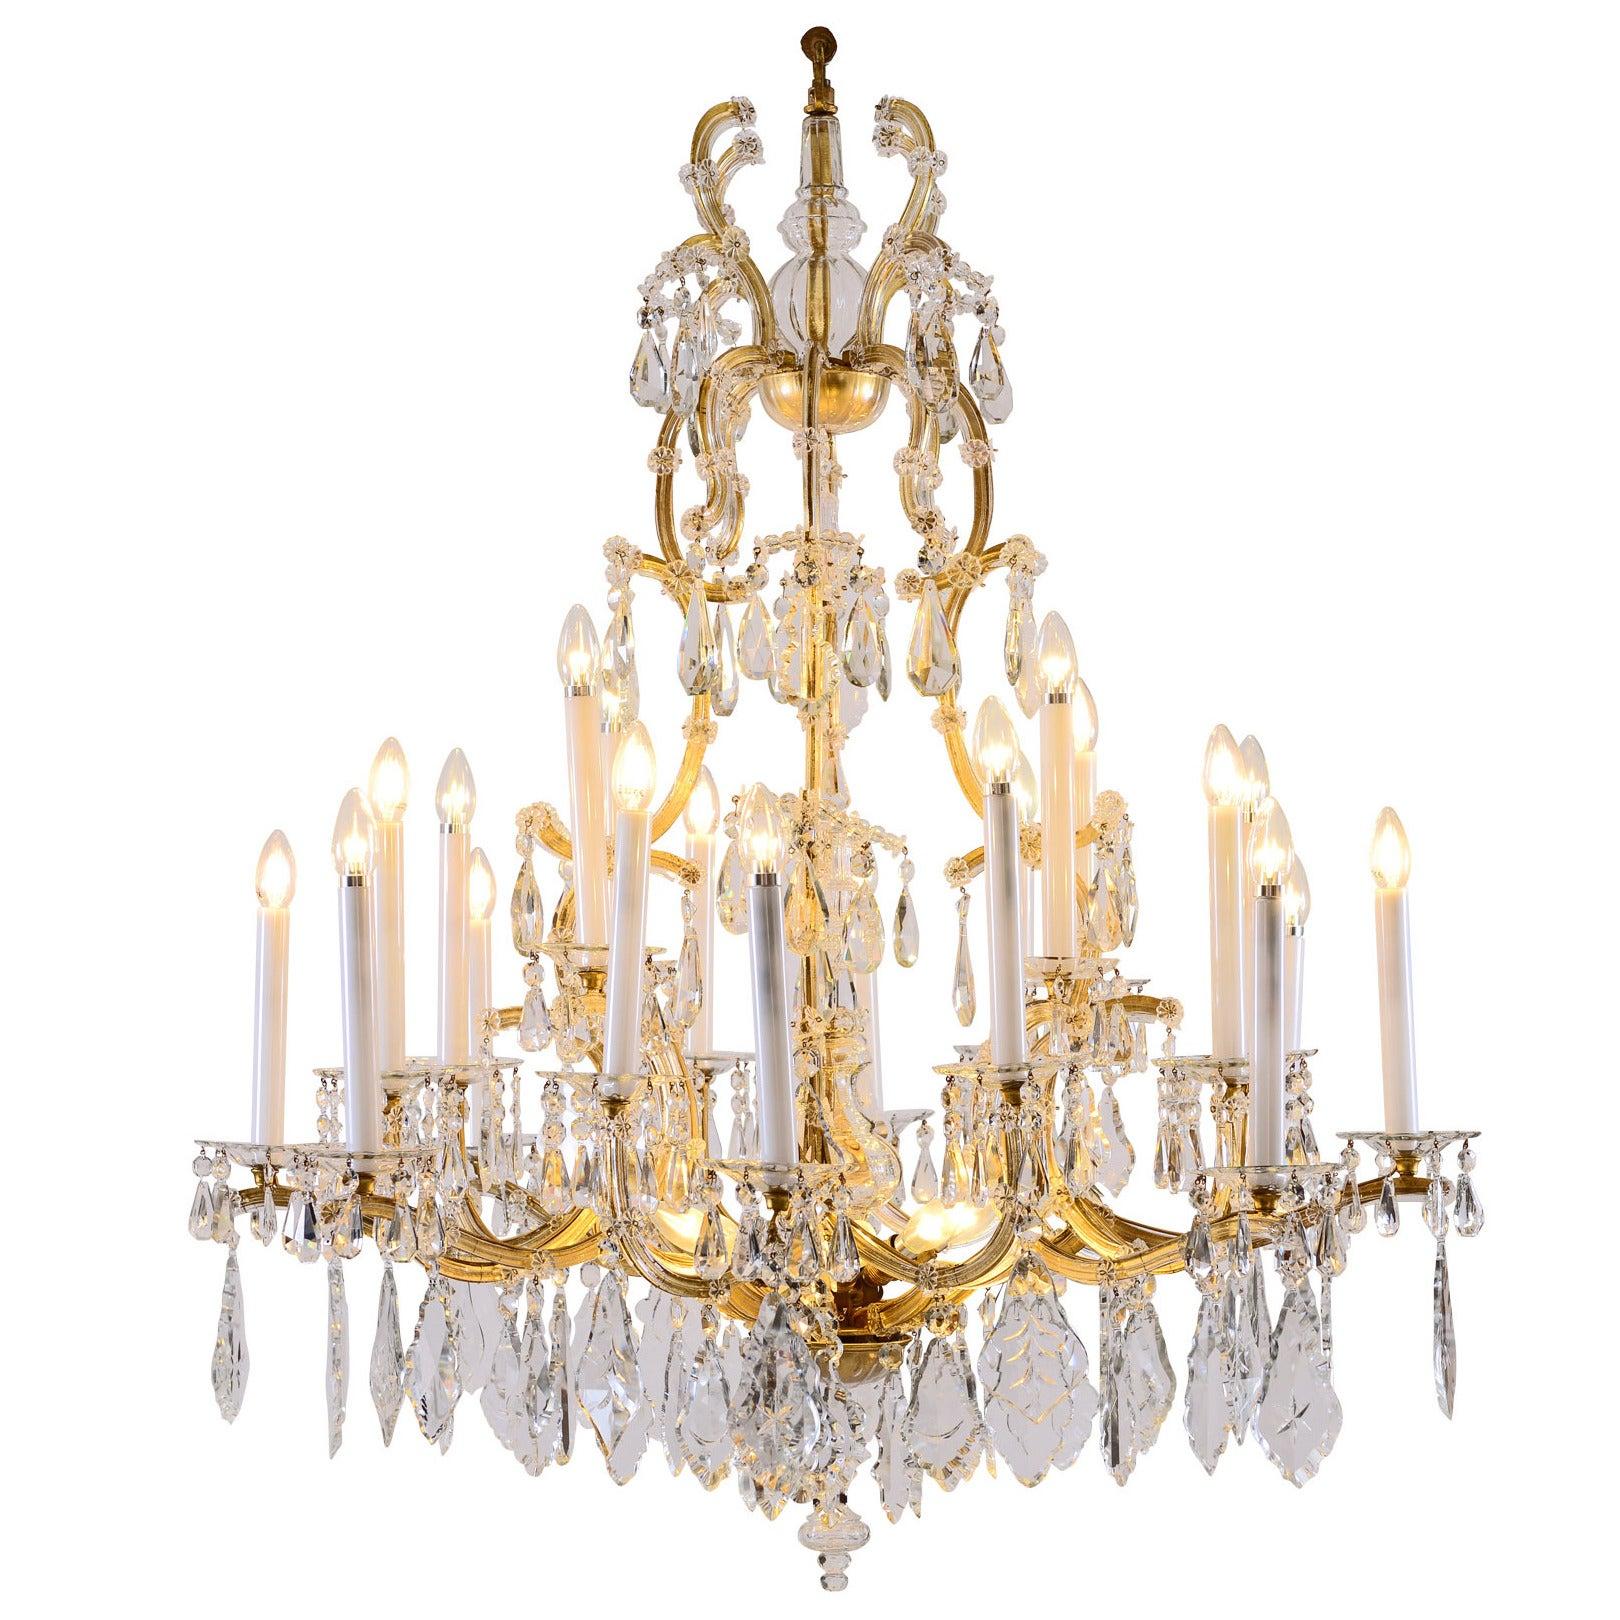 Original Lobmeyr Maria Theresien Crystal Chandelier - richly decorated 28 lights